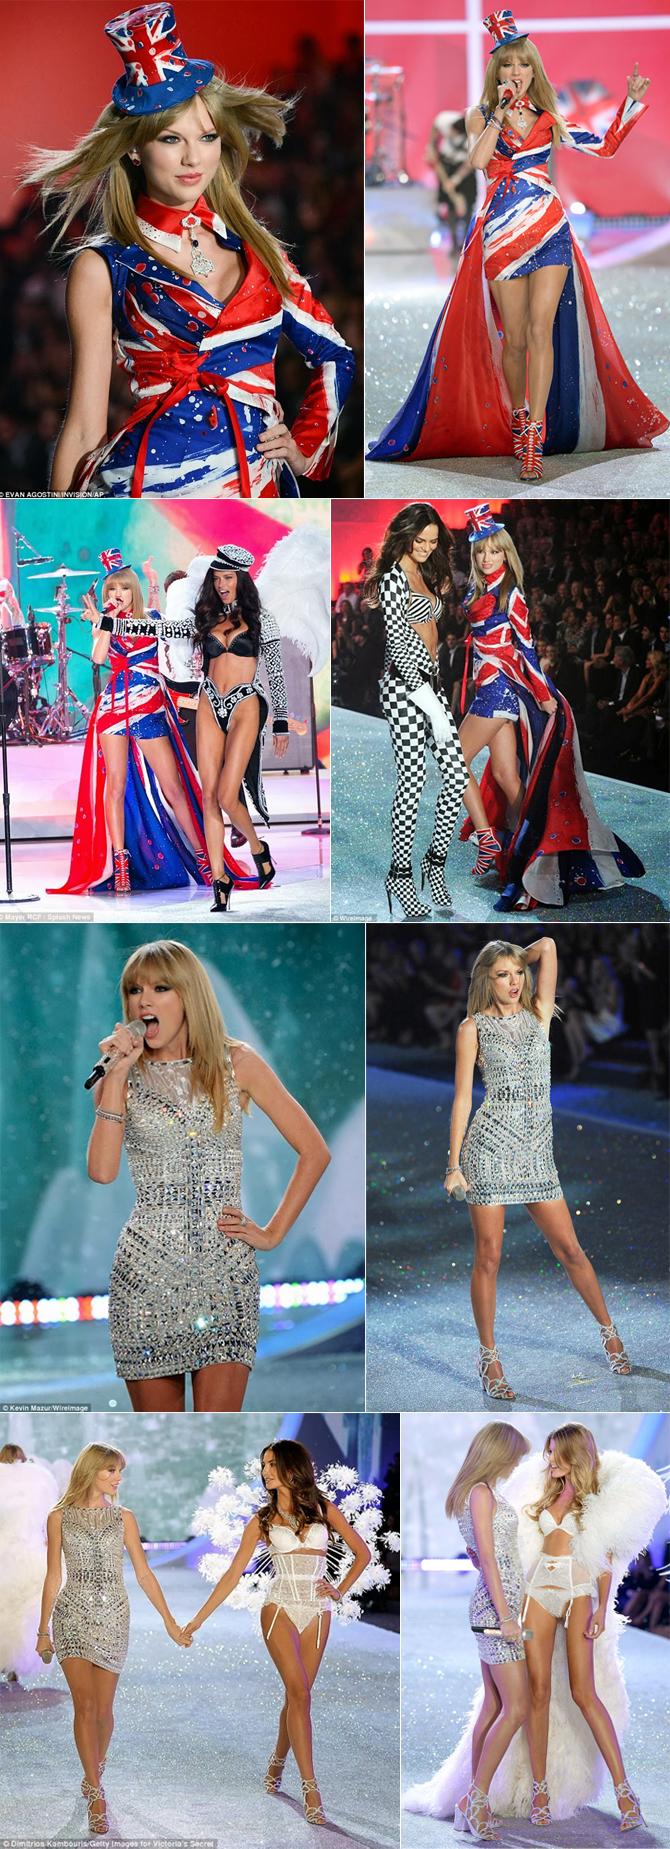 Taylor Swift em desfile da Victoria's Secret copy